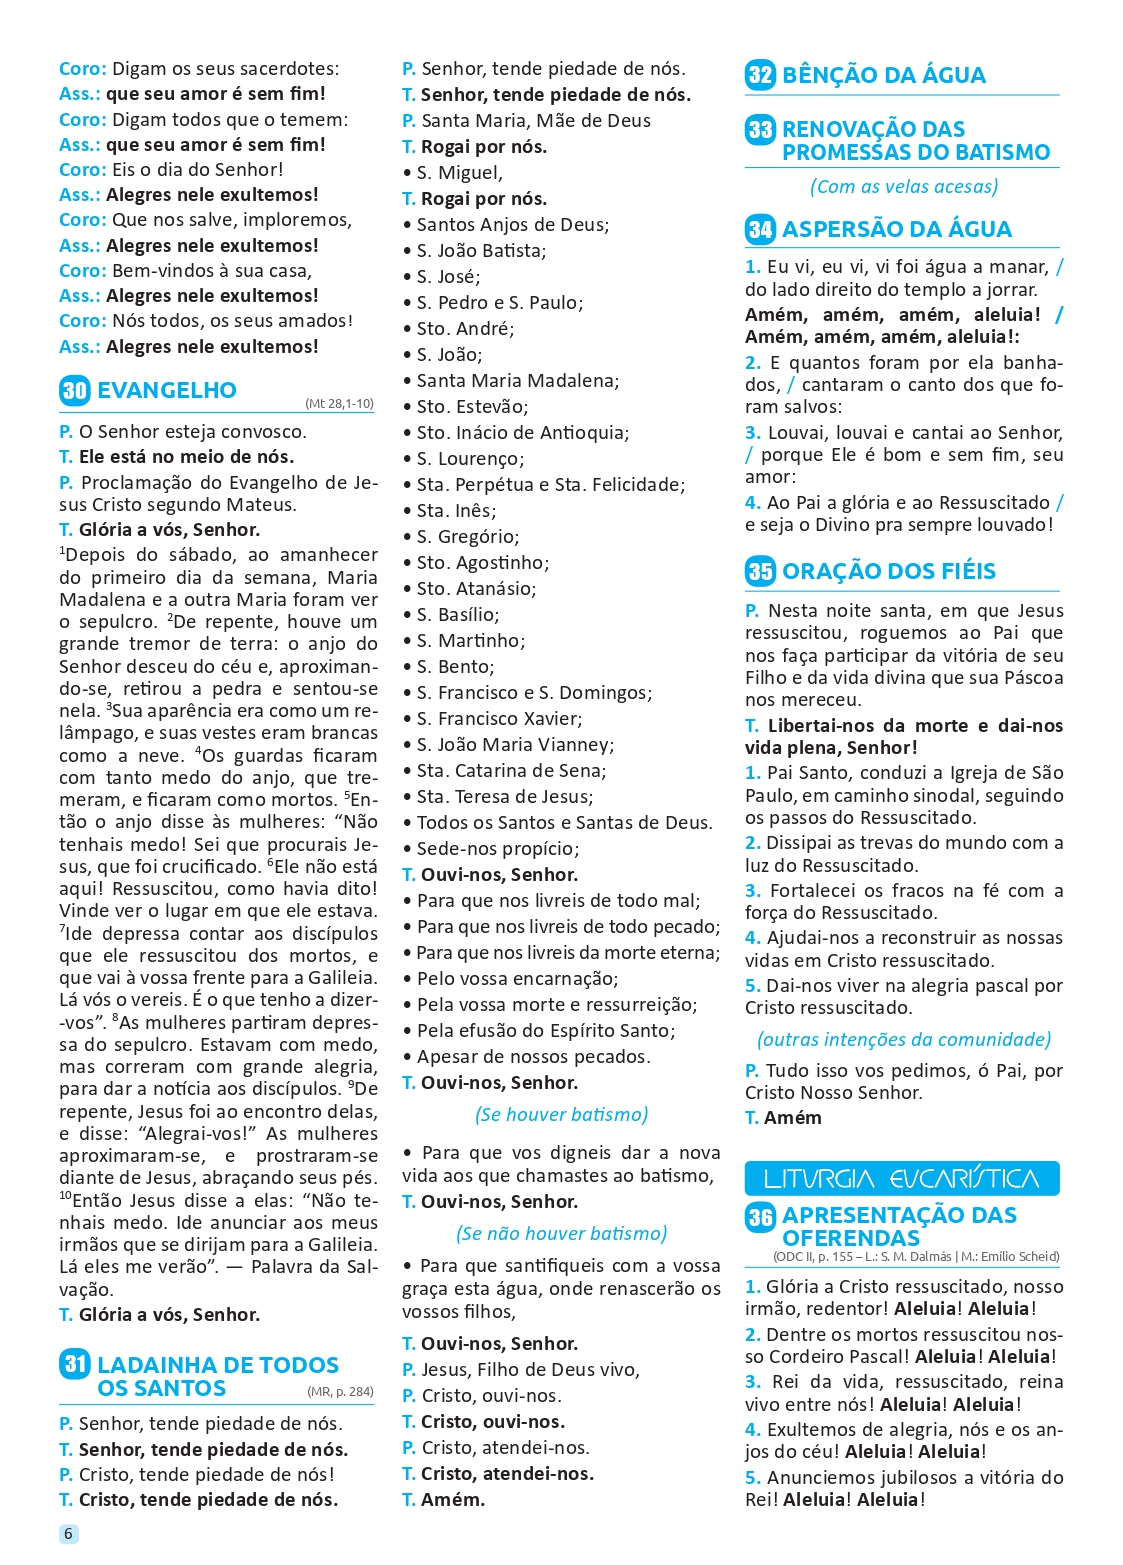 ano_44-a_-_20_-_sabado_santo_vigilia_pascal_2_pages-to-jpg-0006